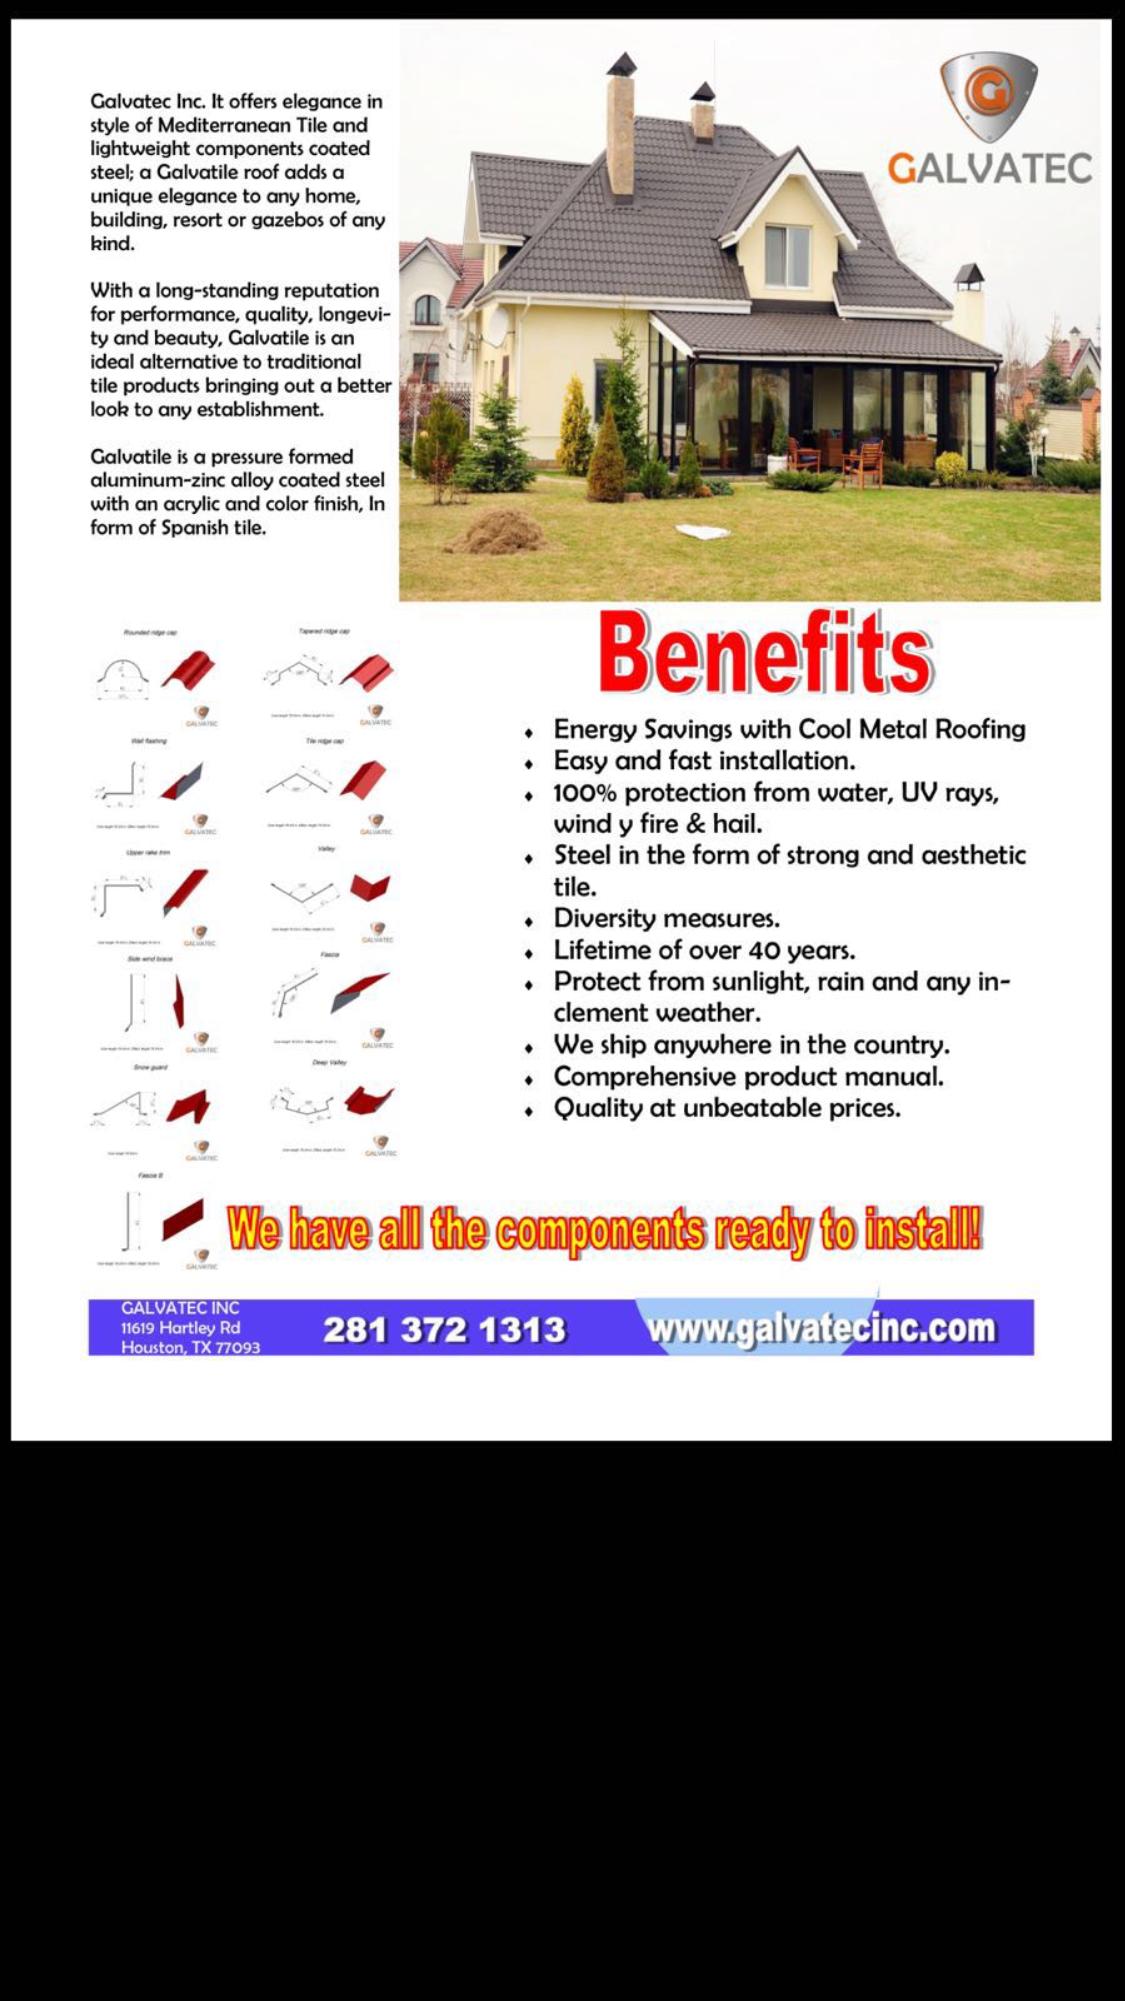 Galvatec Benefits Of Galvatile Image Proview